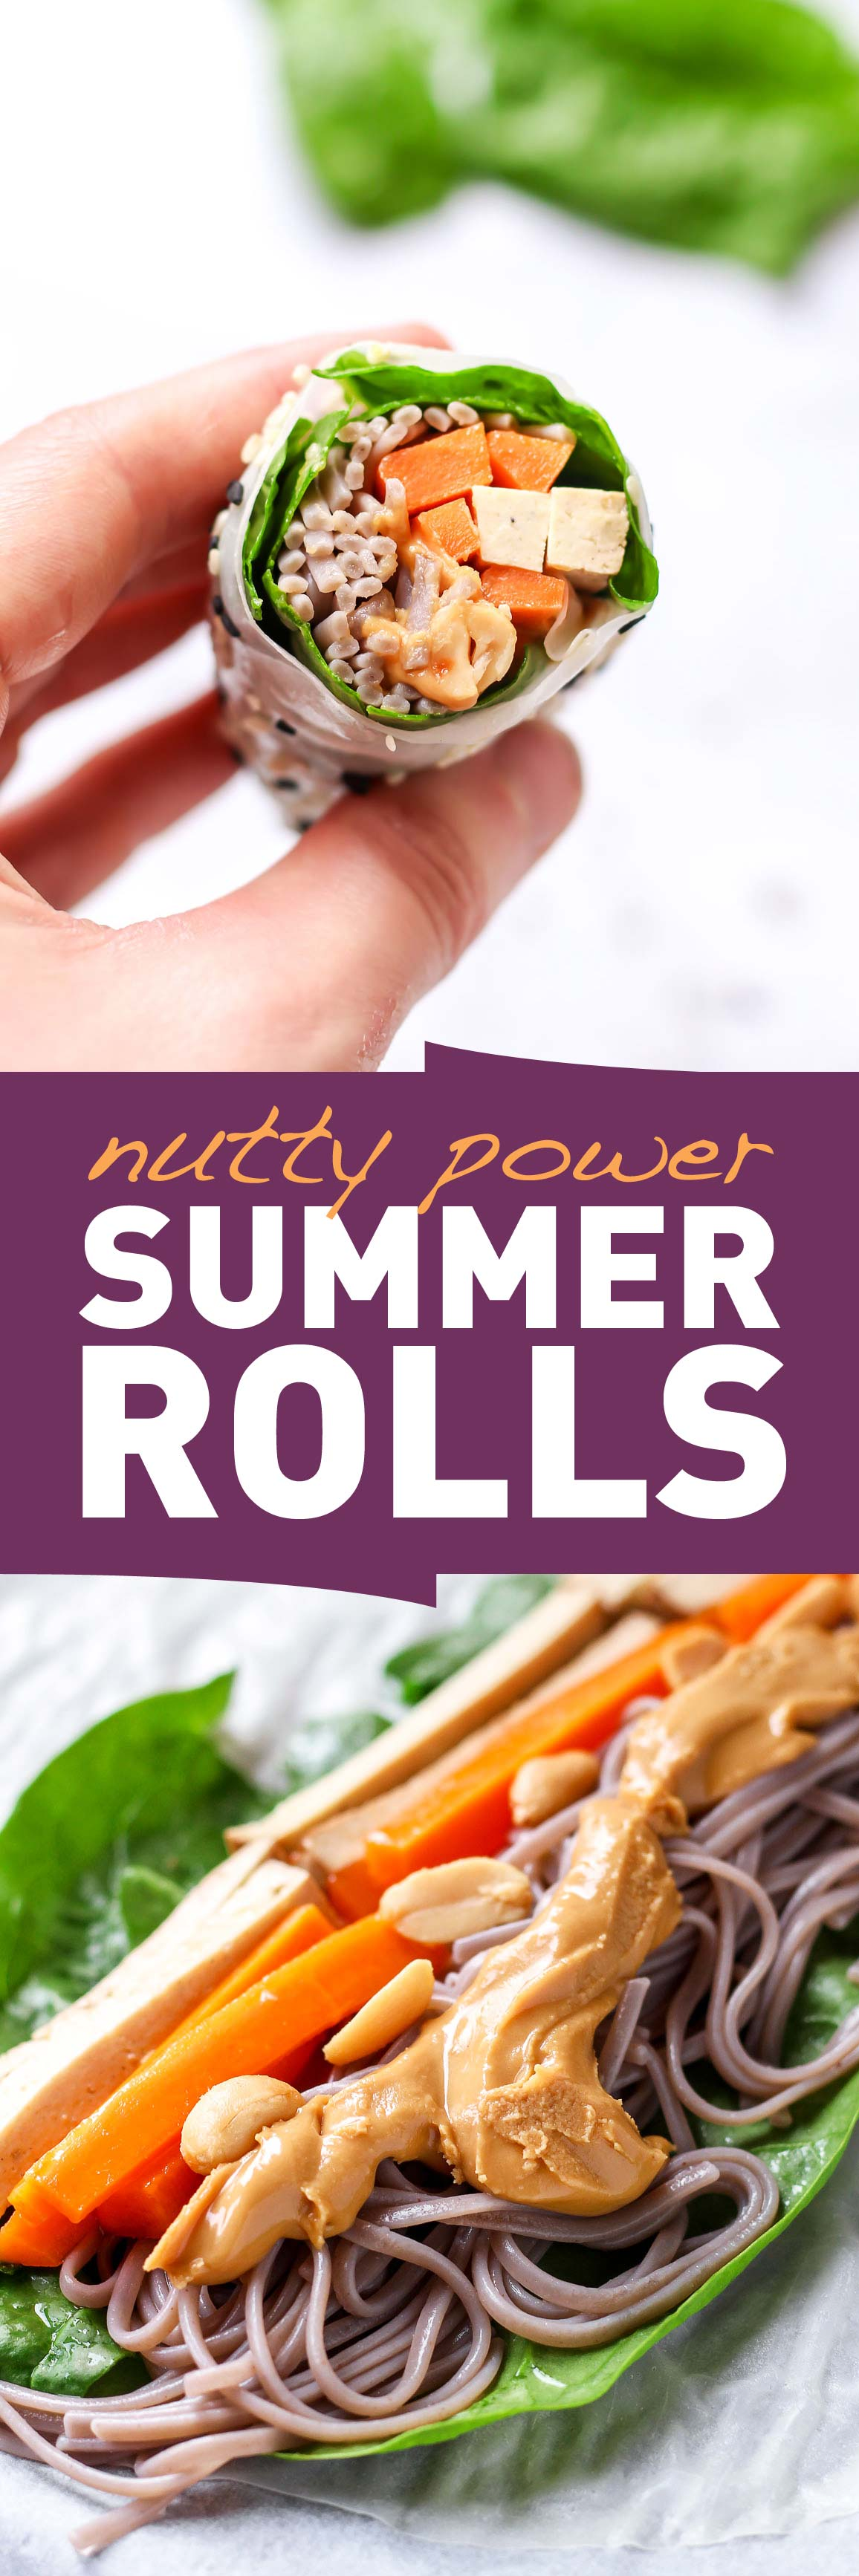 Vegan Nutty Plant Power Summer Rolls